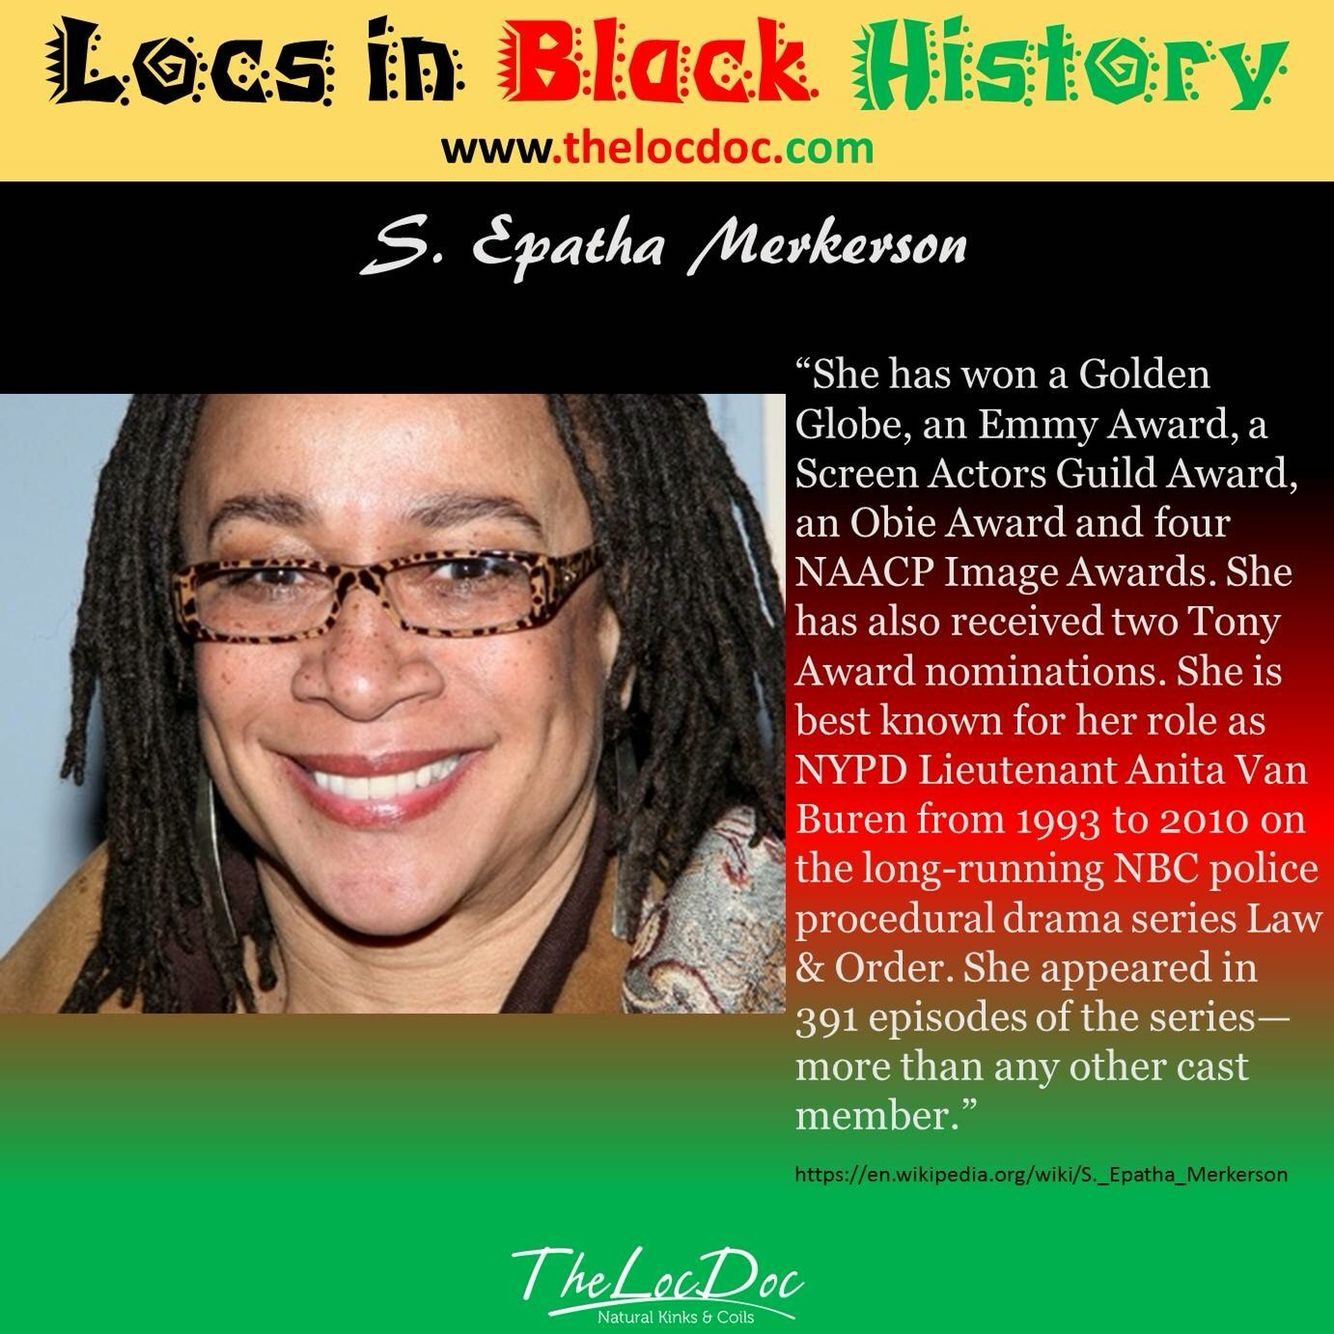 S. Paths Merkerson Black history, History, Education